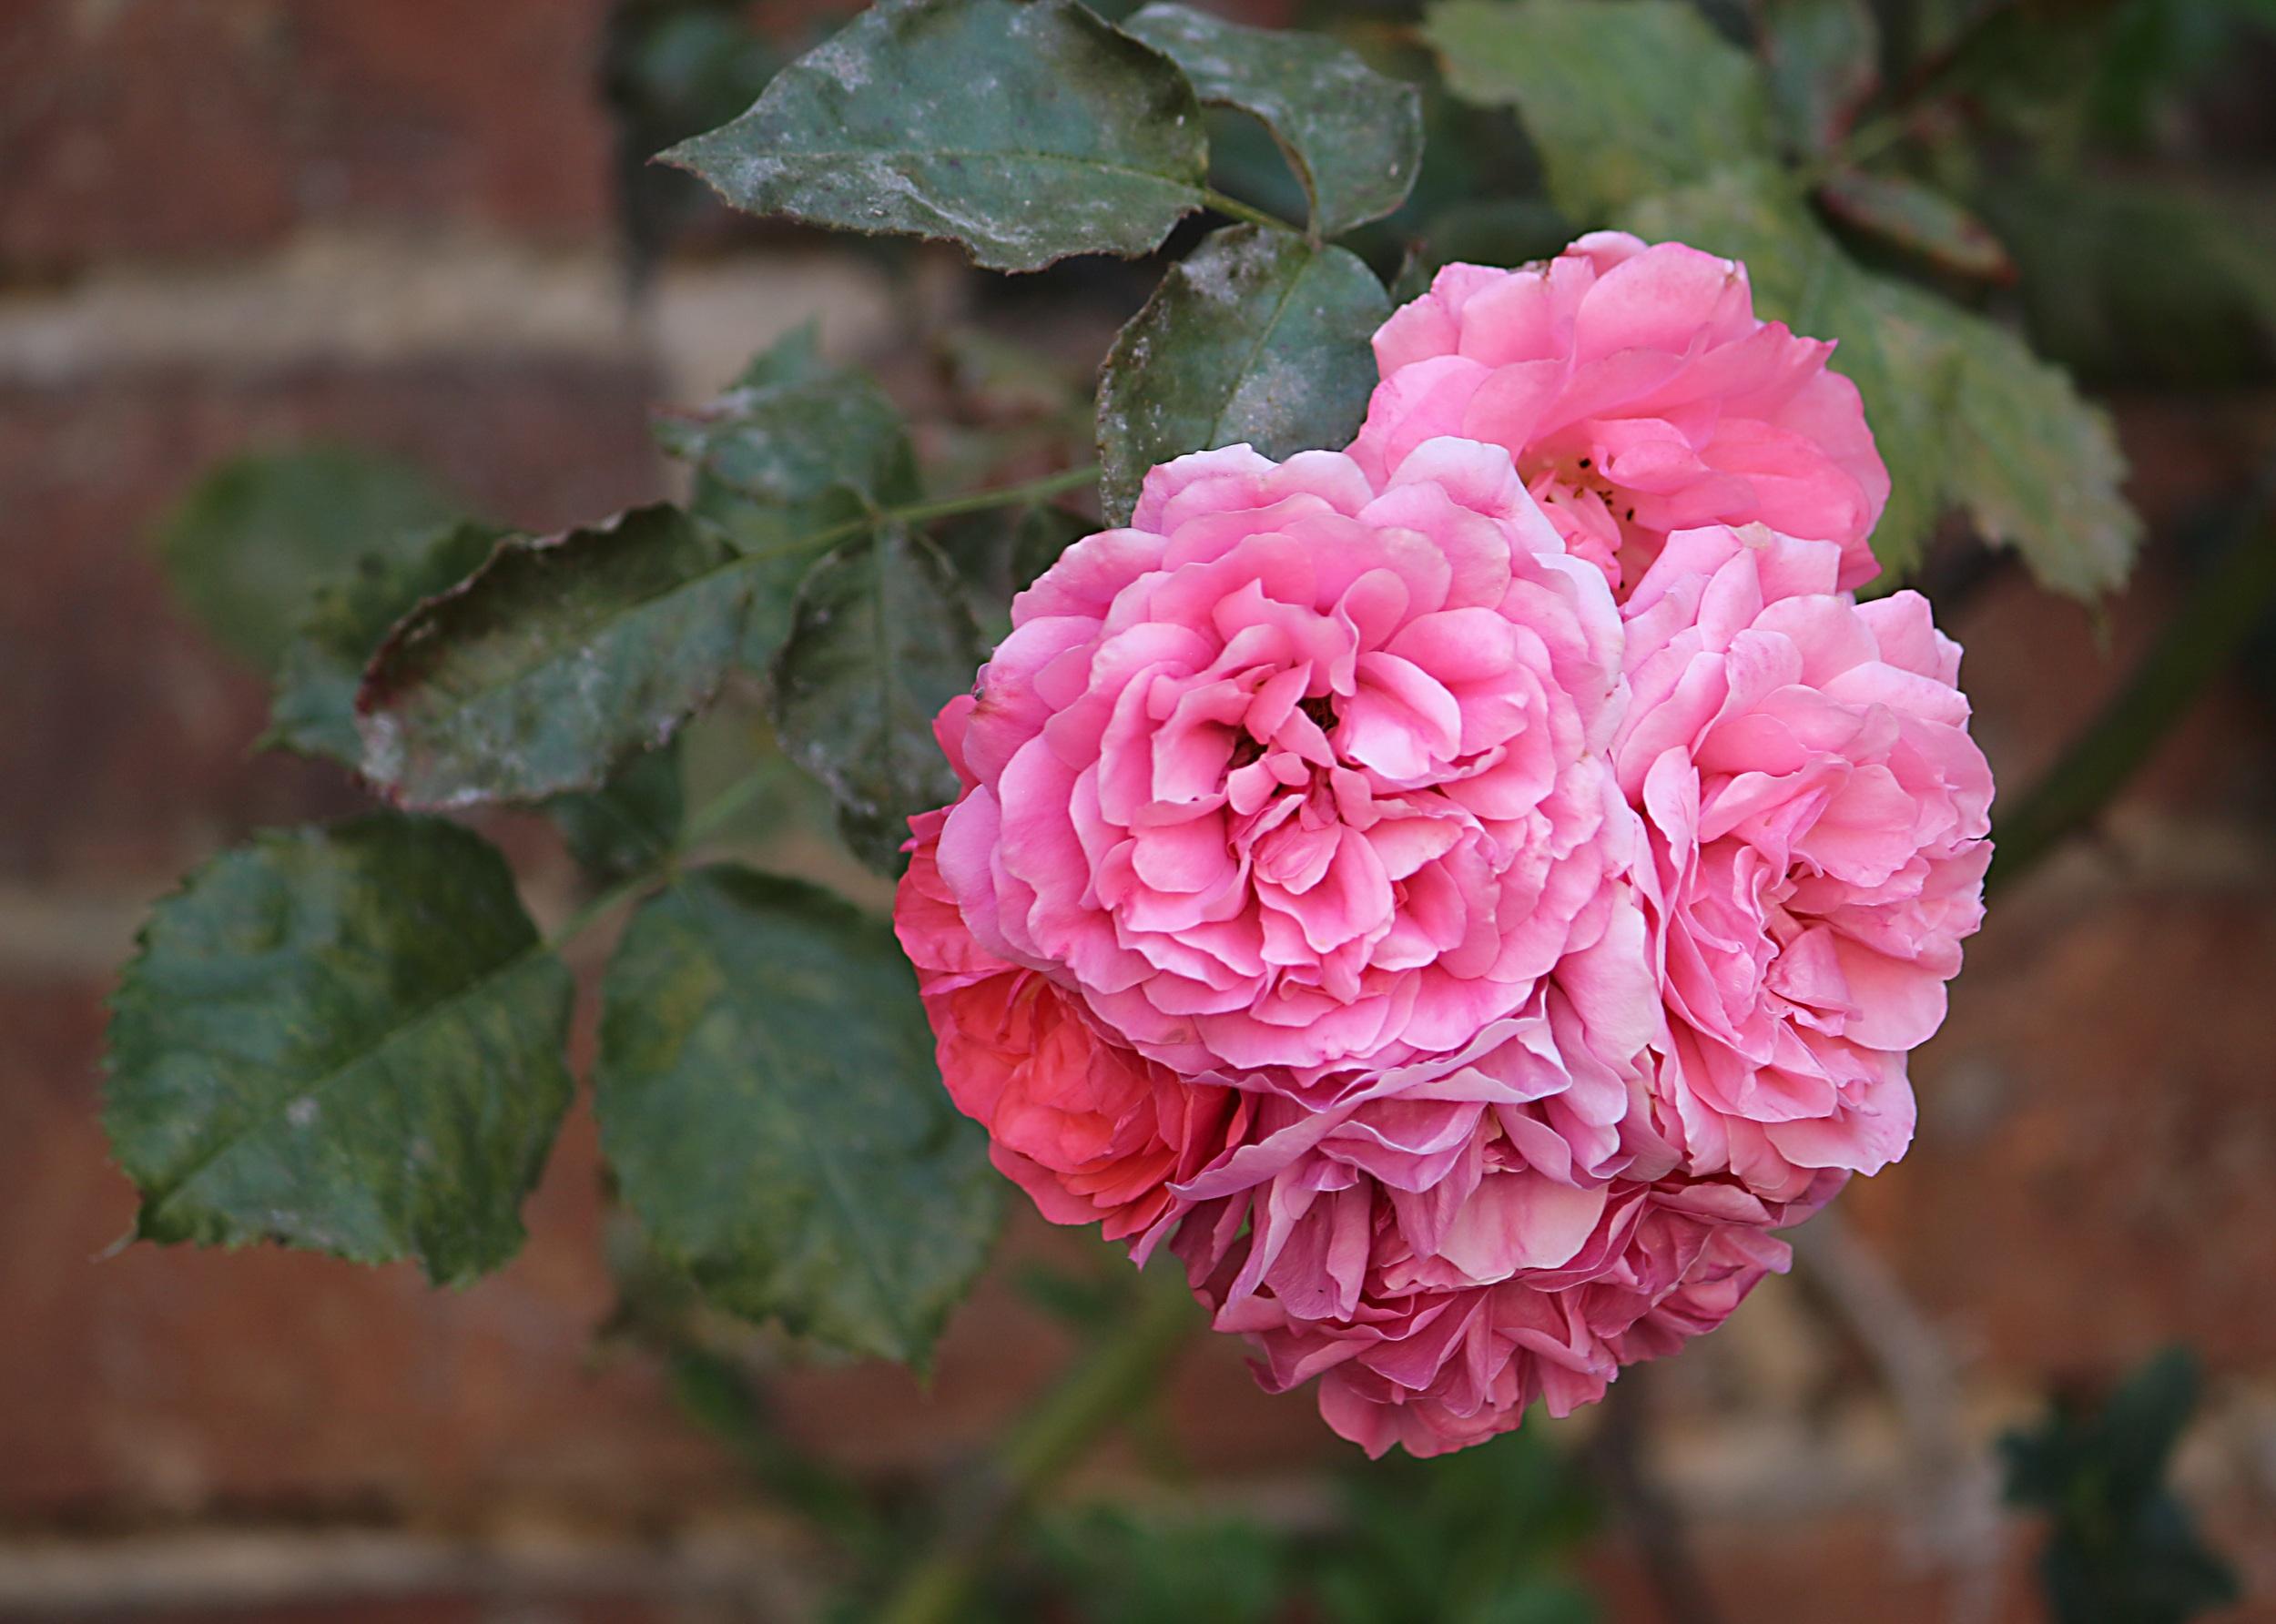 Download 1010+ Gambar Bunga Mawar Yg Gugur Paling Cantik HD